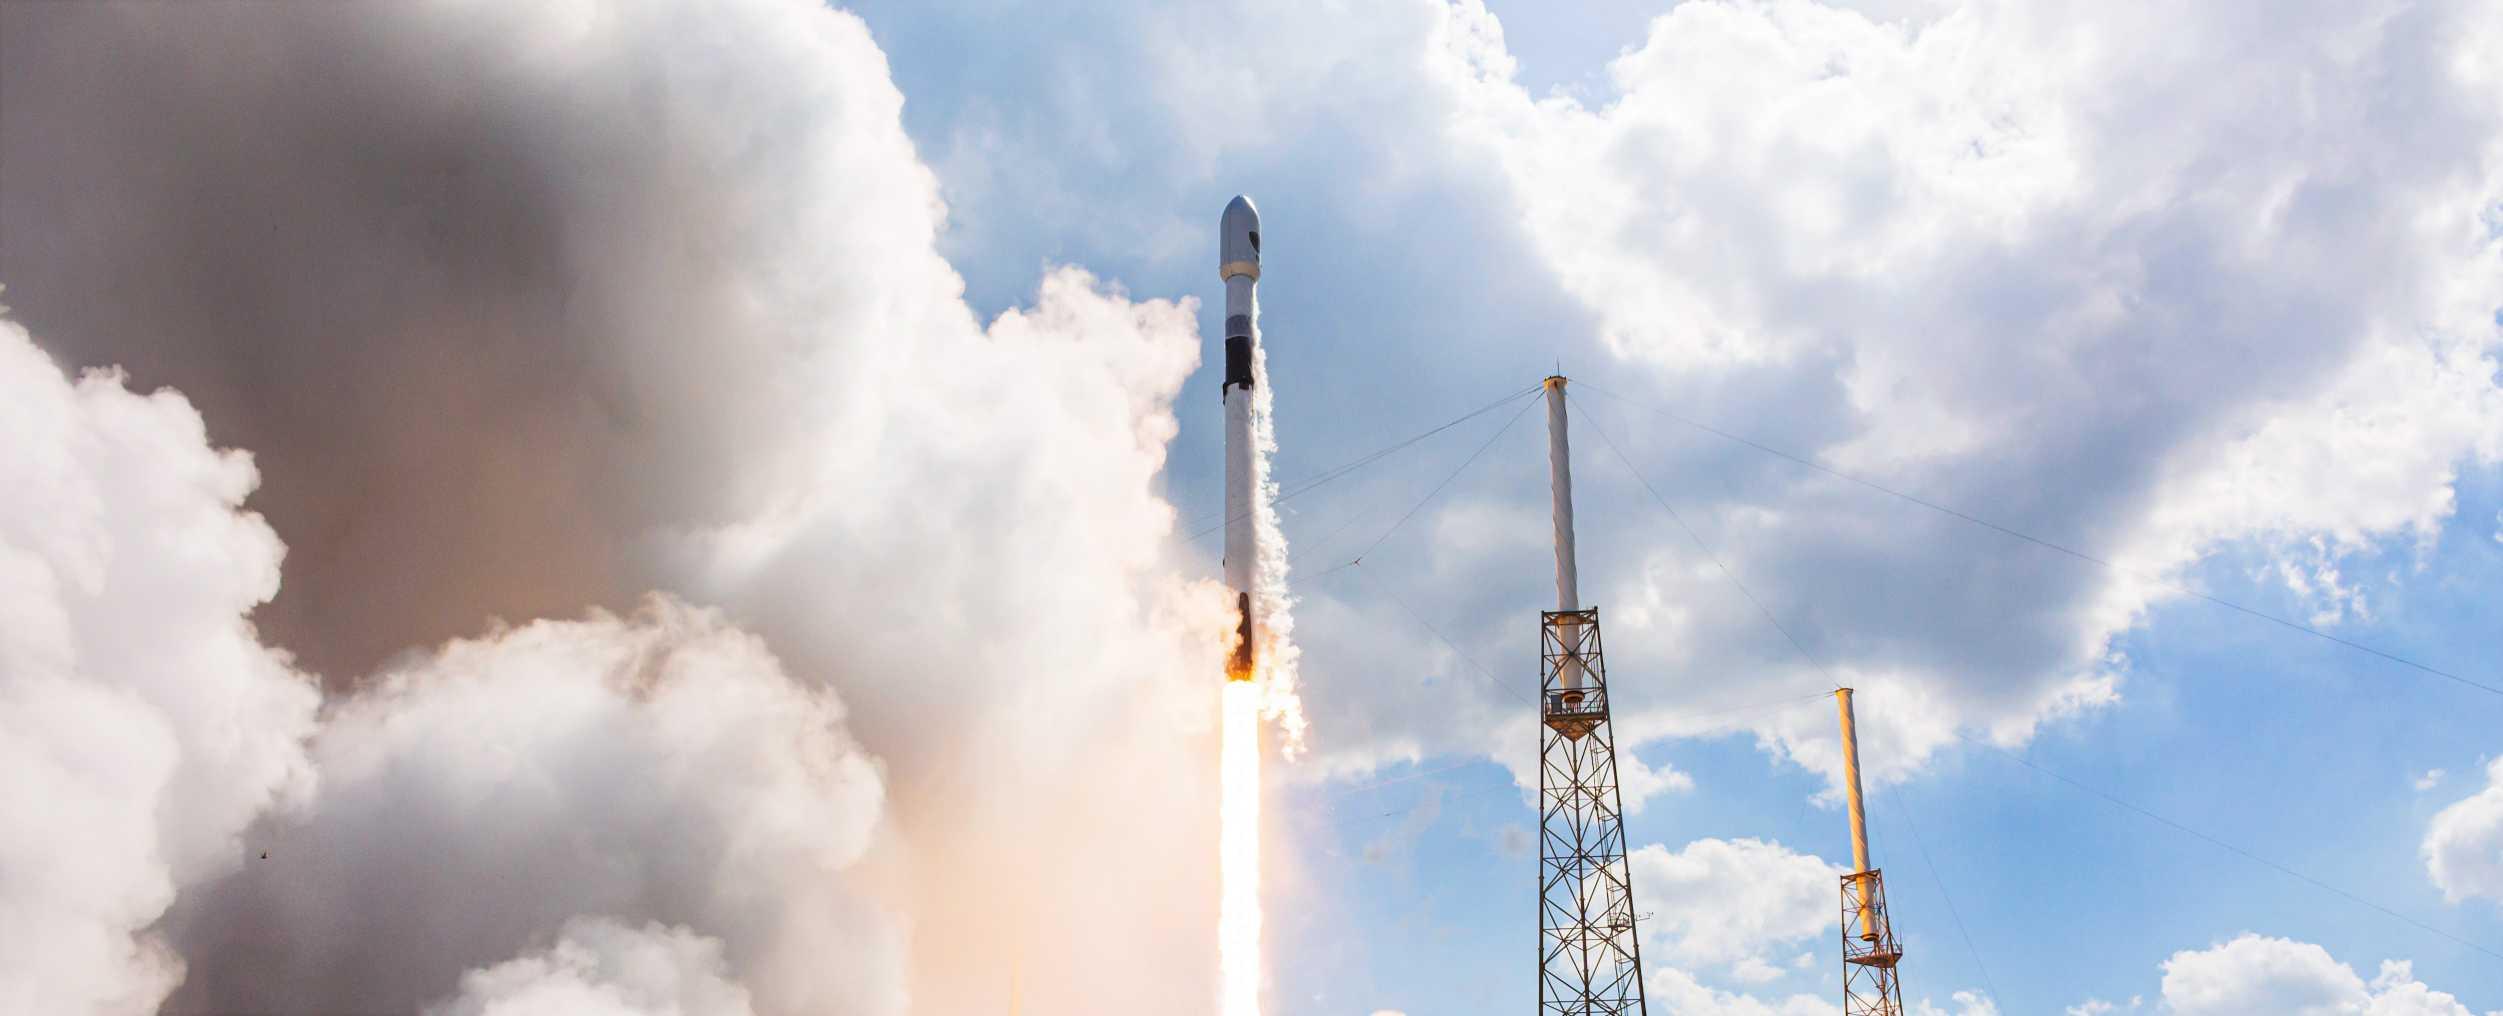 GPS III SV03 Falcon 9 B1060 063020 (Richard Angle) launch 7 crop (c)